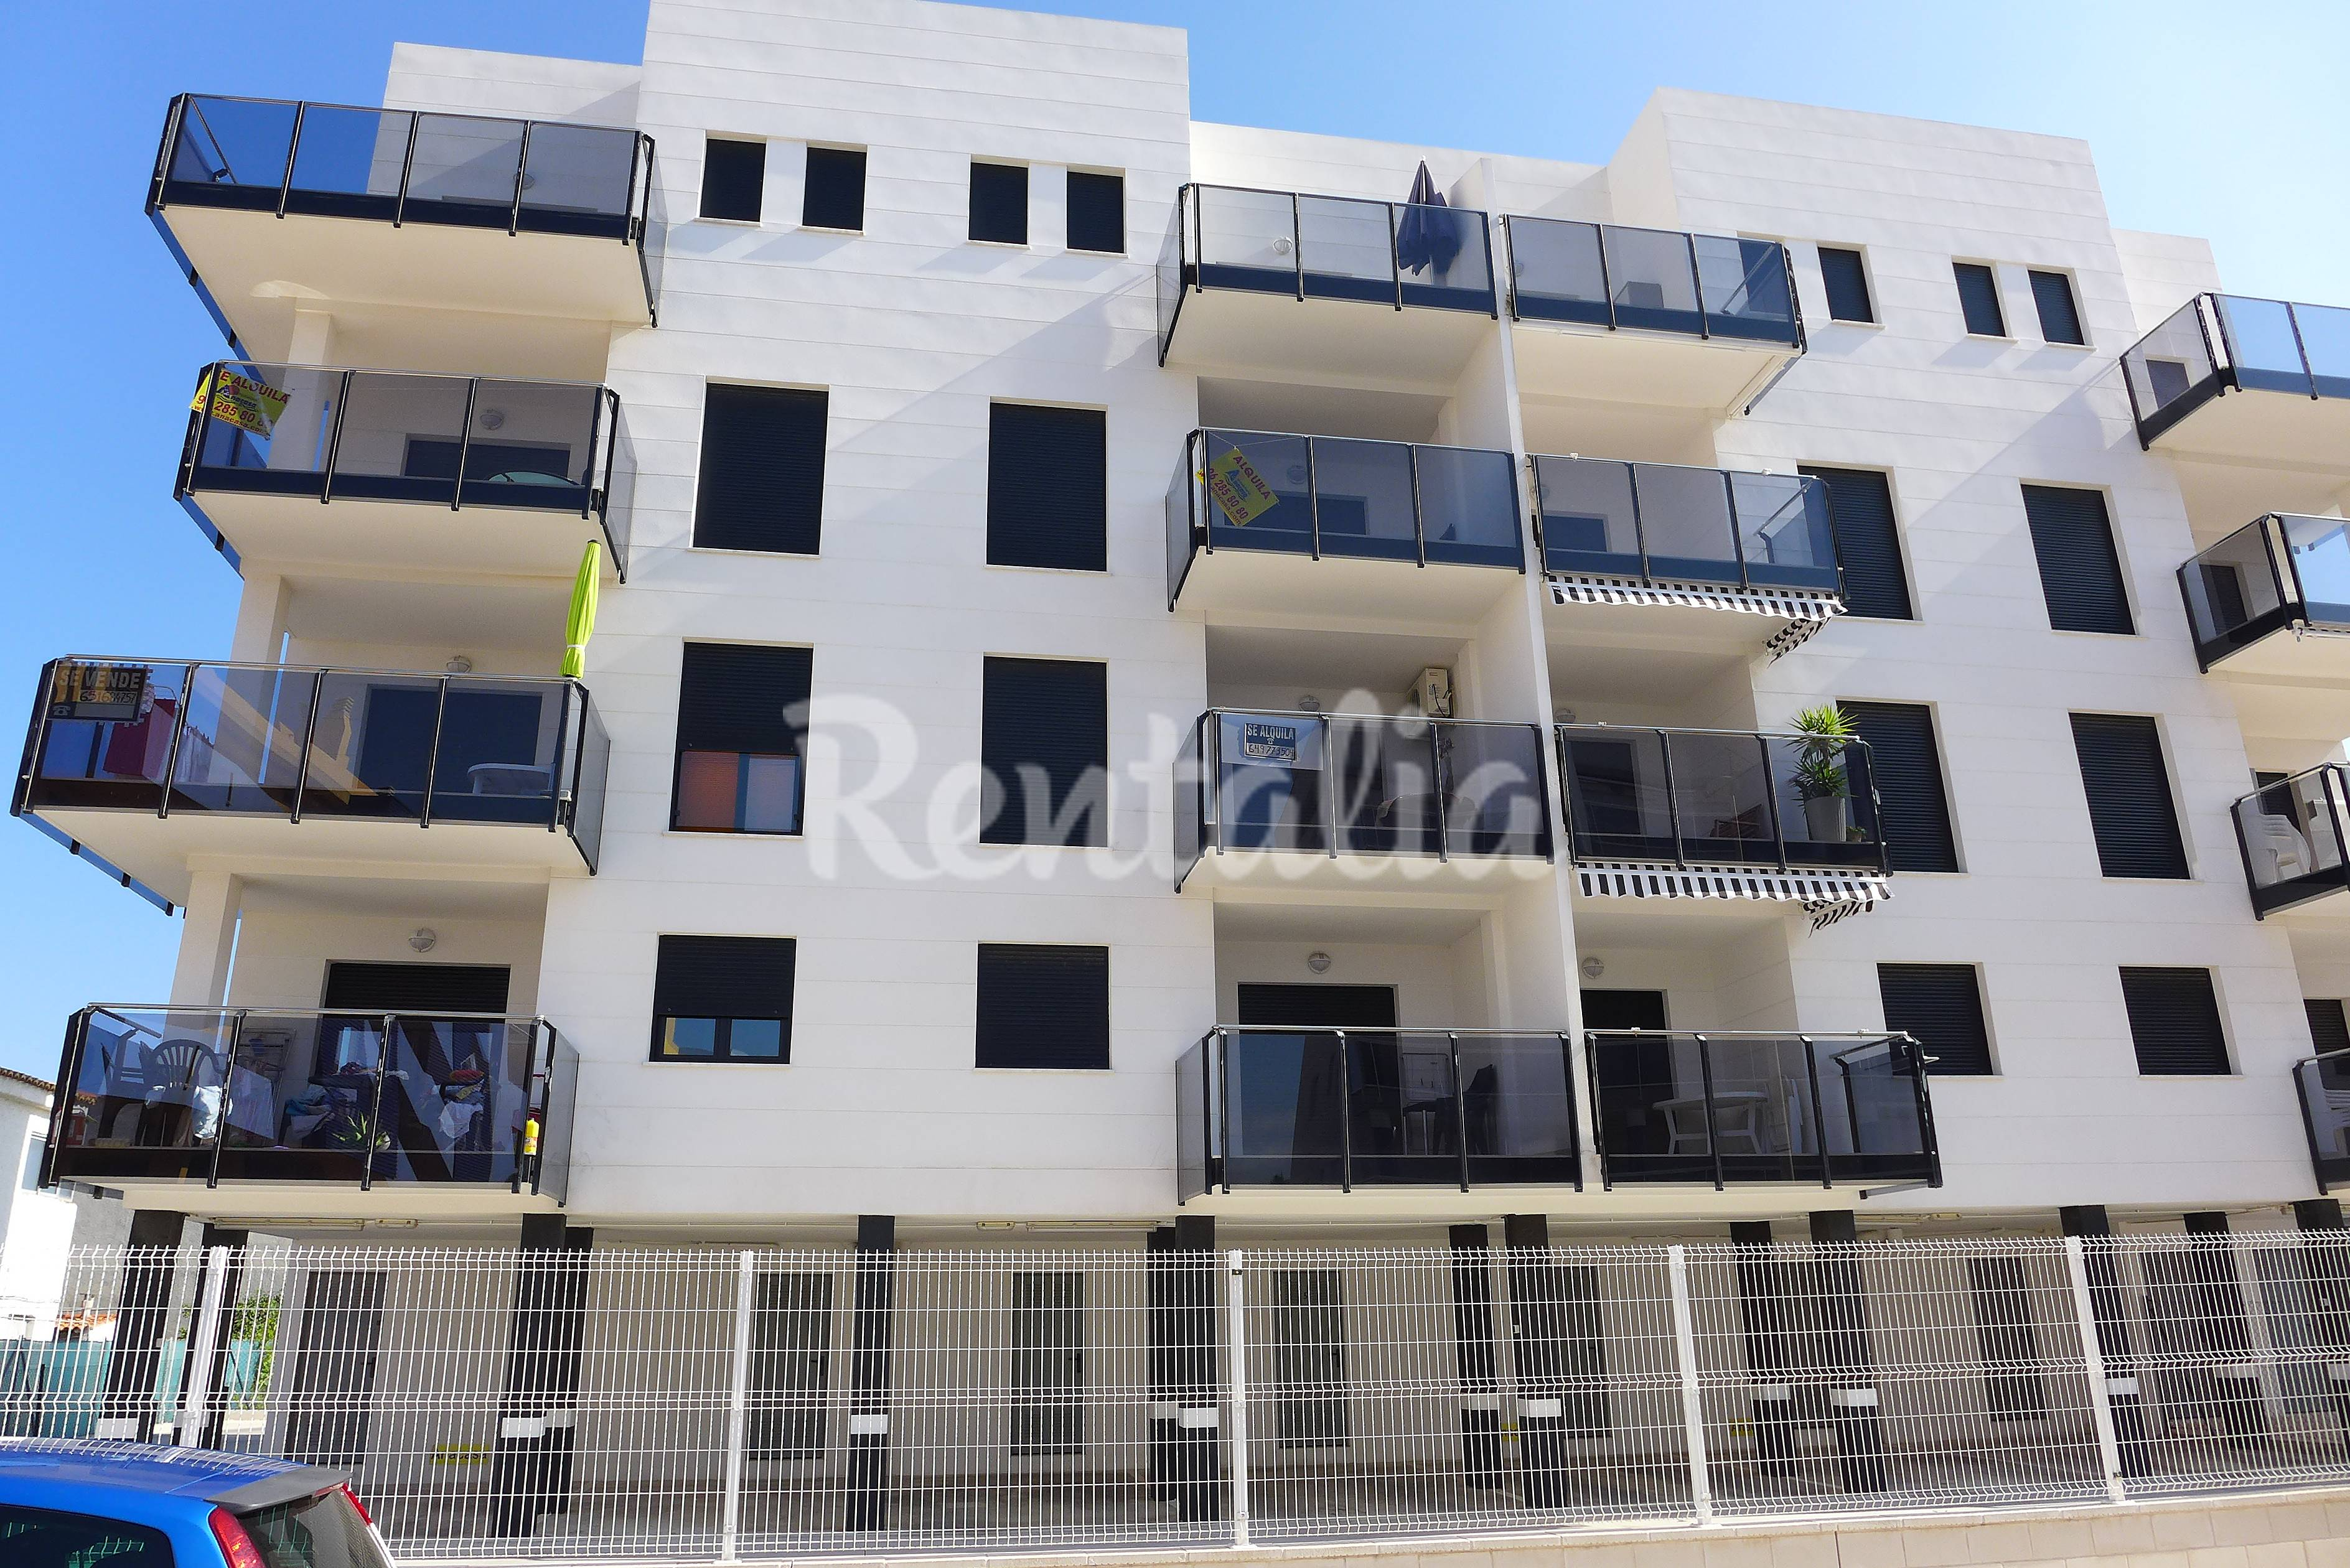 Apartamentos alquiler en playa de bellreguard bellreguard platja bellreguard valencia - Apartamentos ibiza alquiler ...